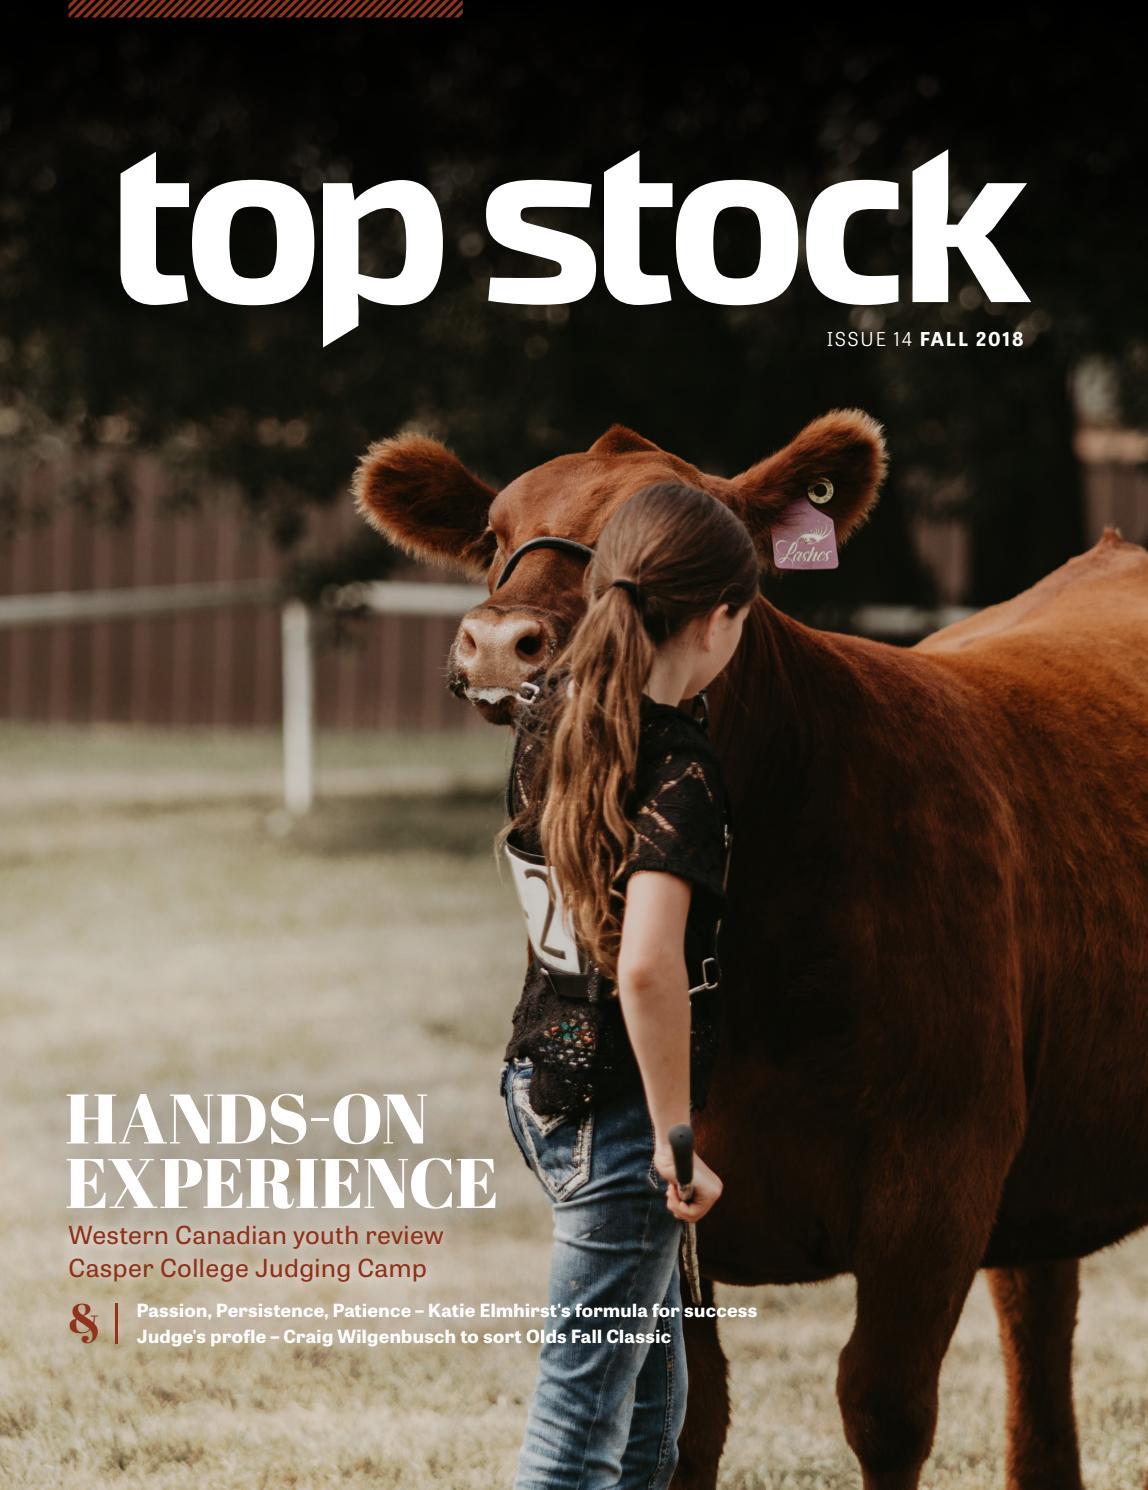 6b4ae37f6d729 Top Stock Magazine September 2018 by Top Stock Magazine - issuu